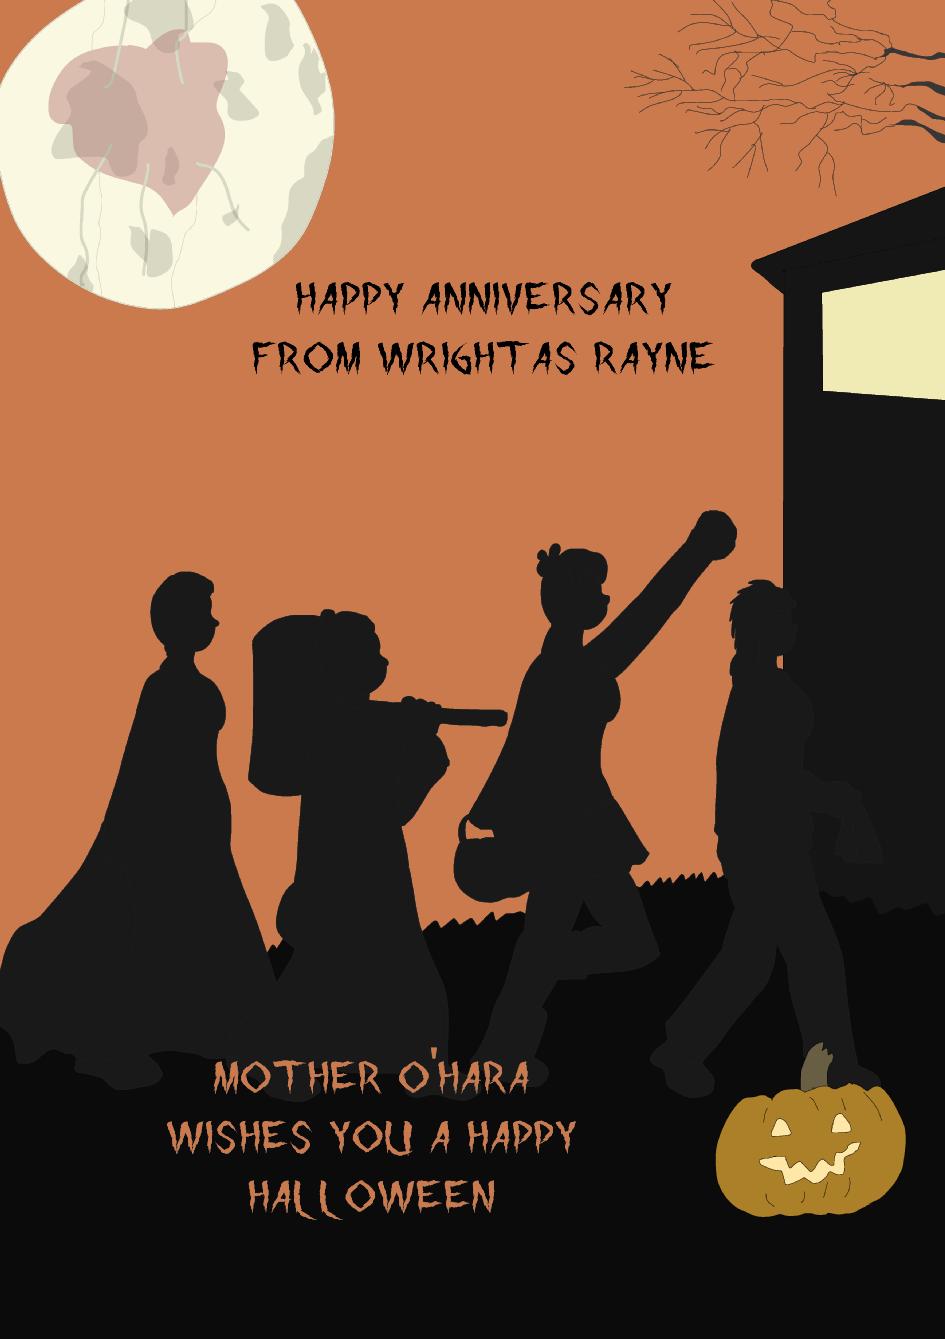 Wright as Rayne's Fifth Anniversary